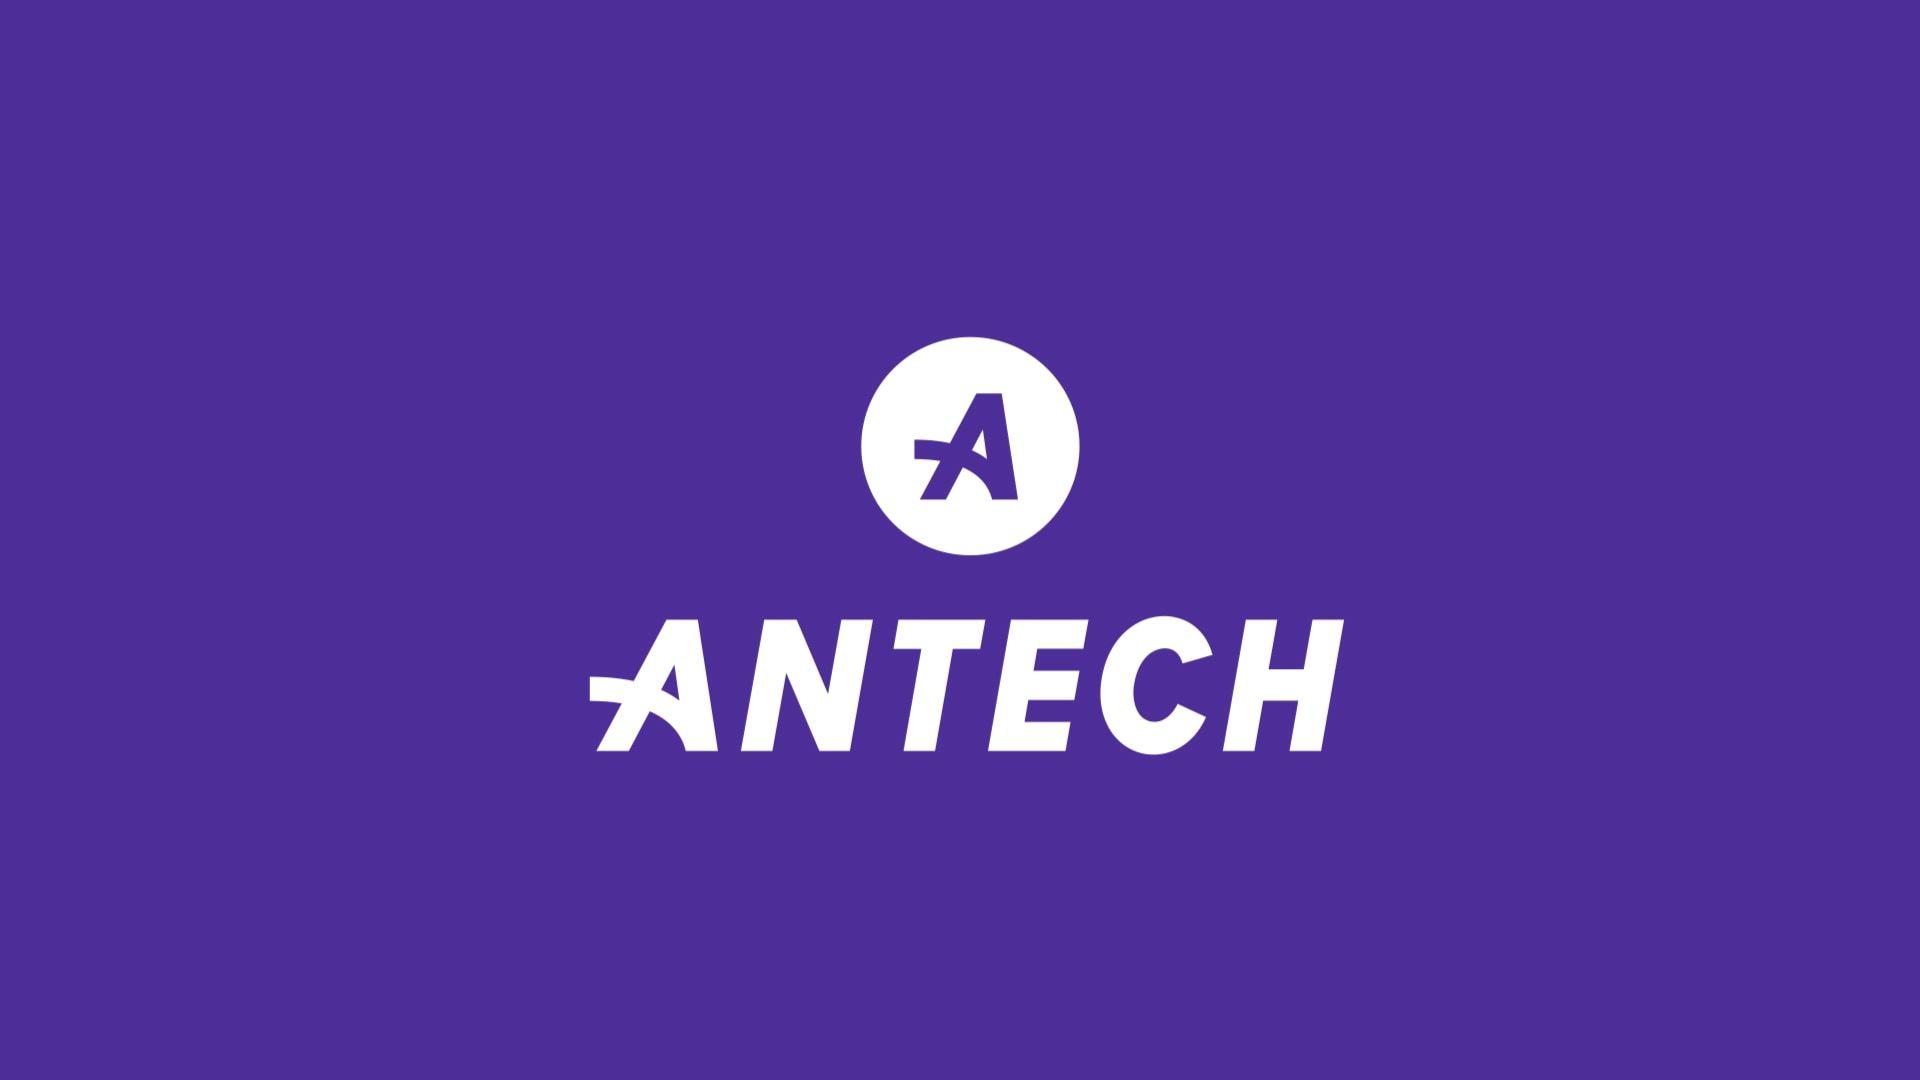 02 Case Study Antech Video Preview Logo Animation